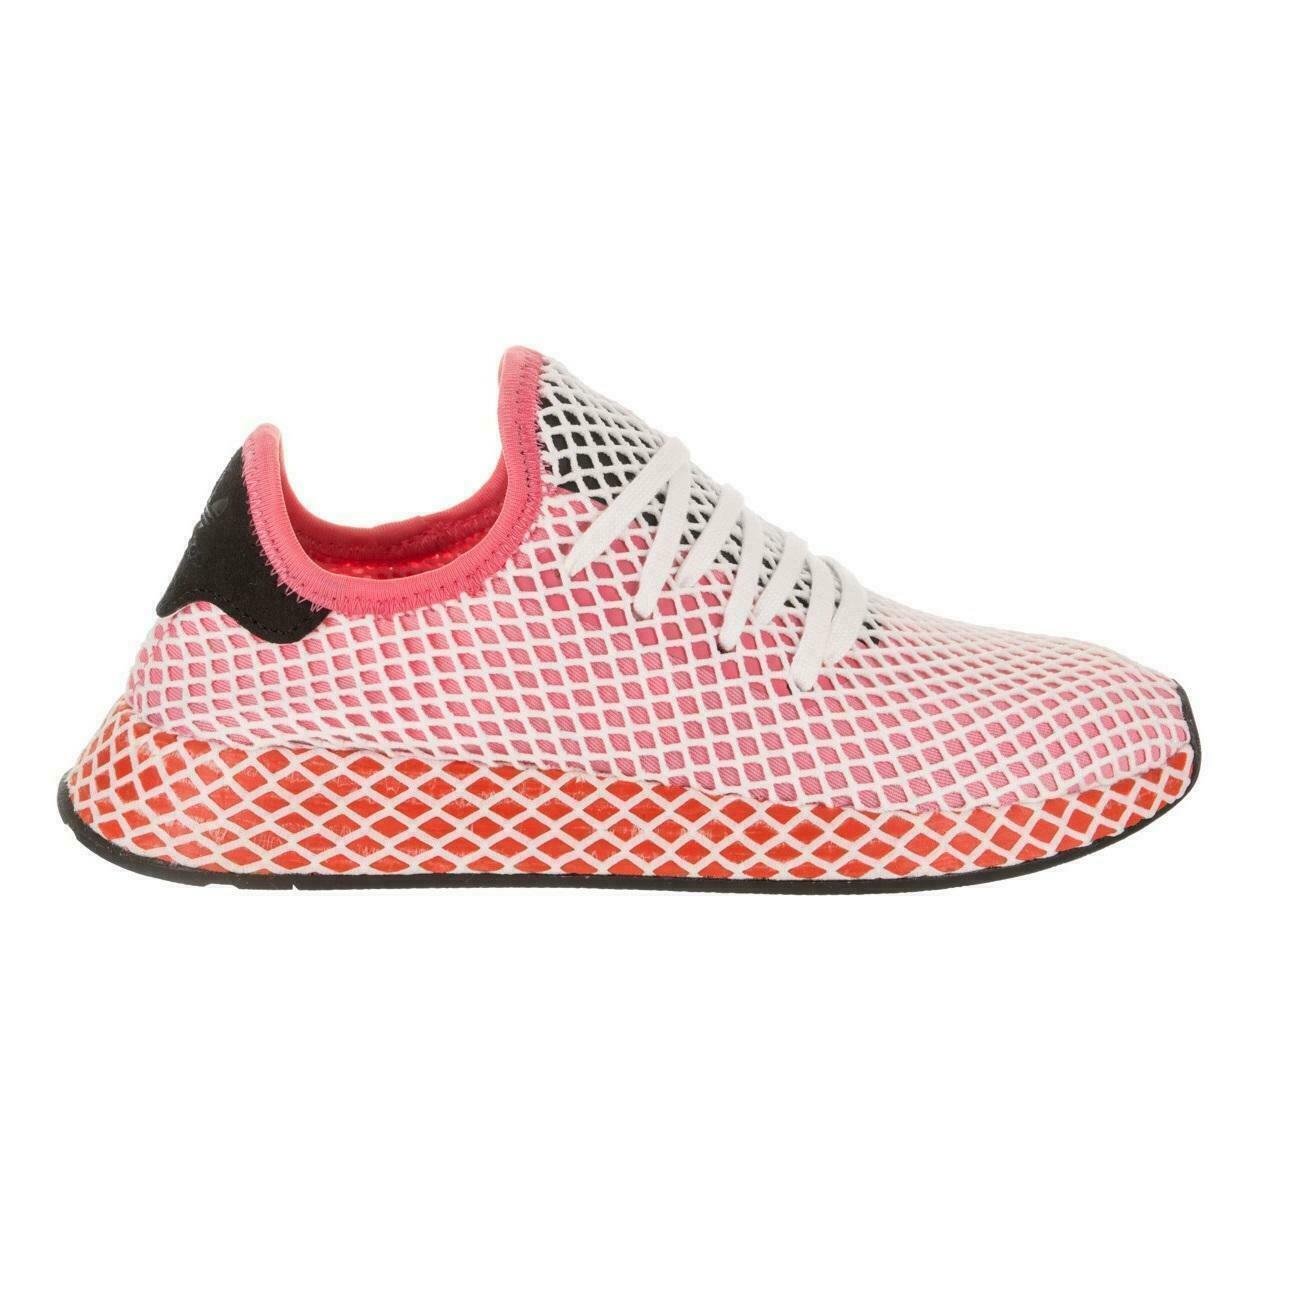 Originale donna Adidas Deeptt Runner Trainers  CQ2910  ordinare on-line